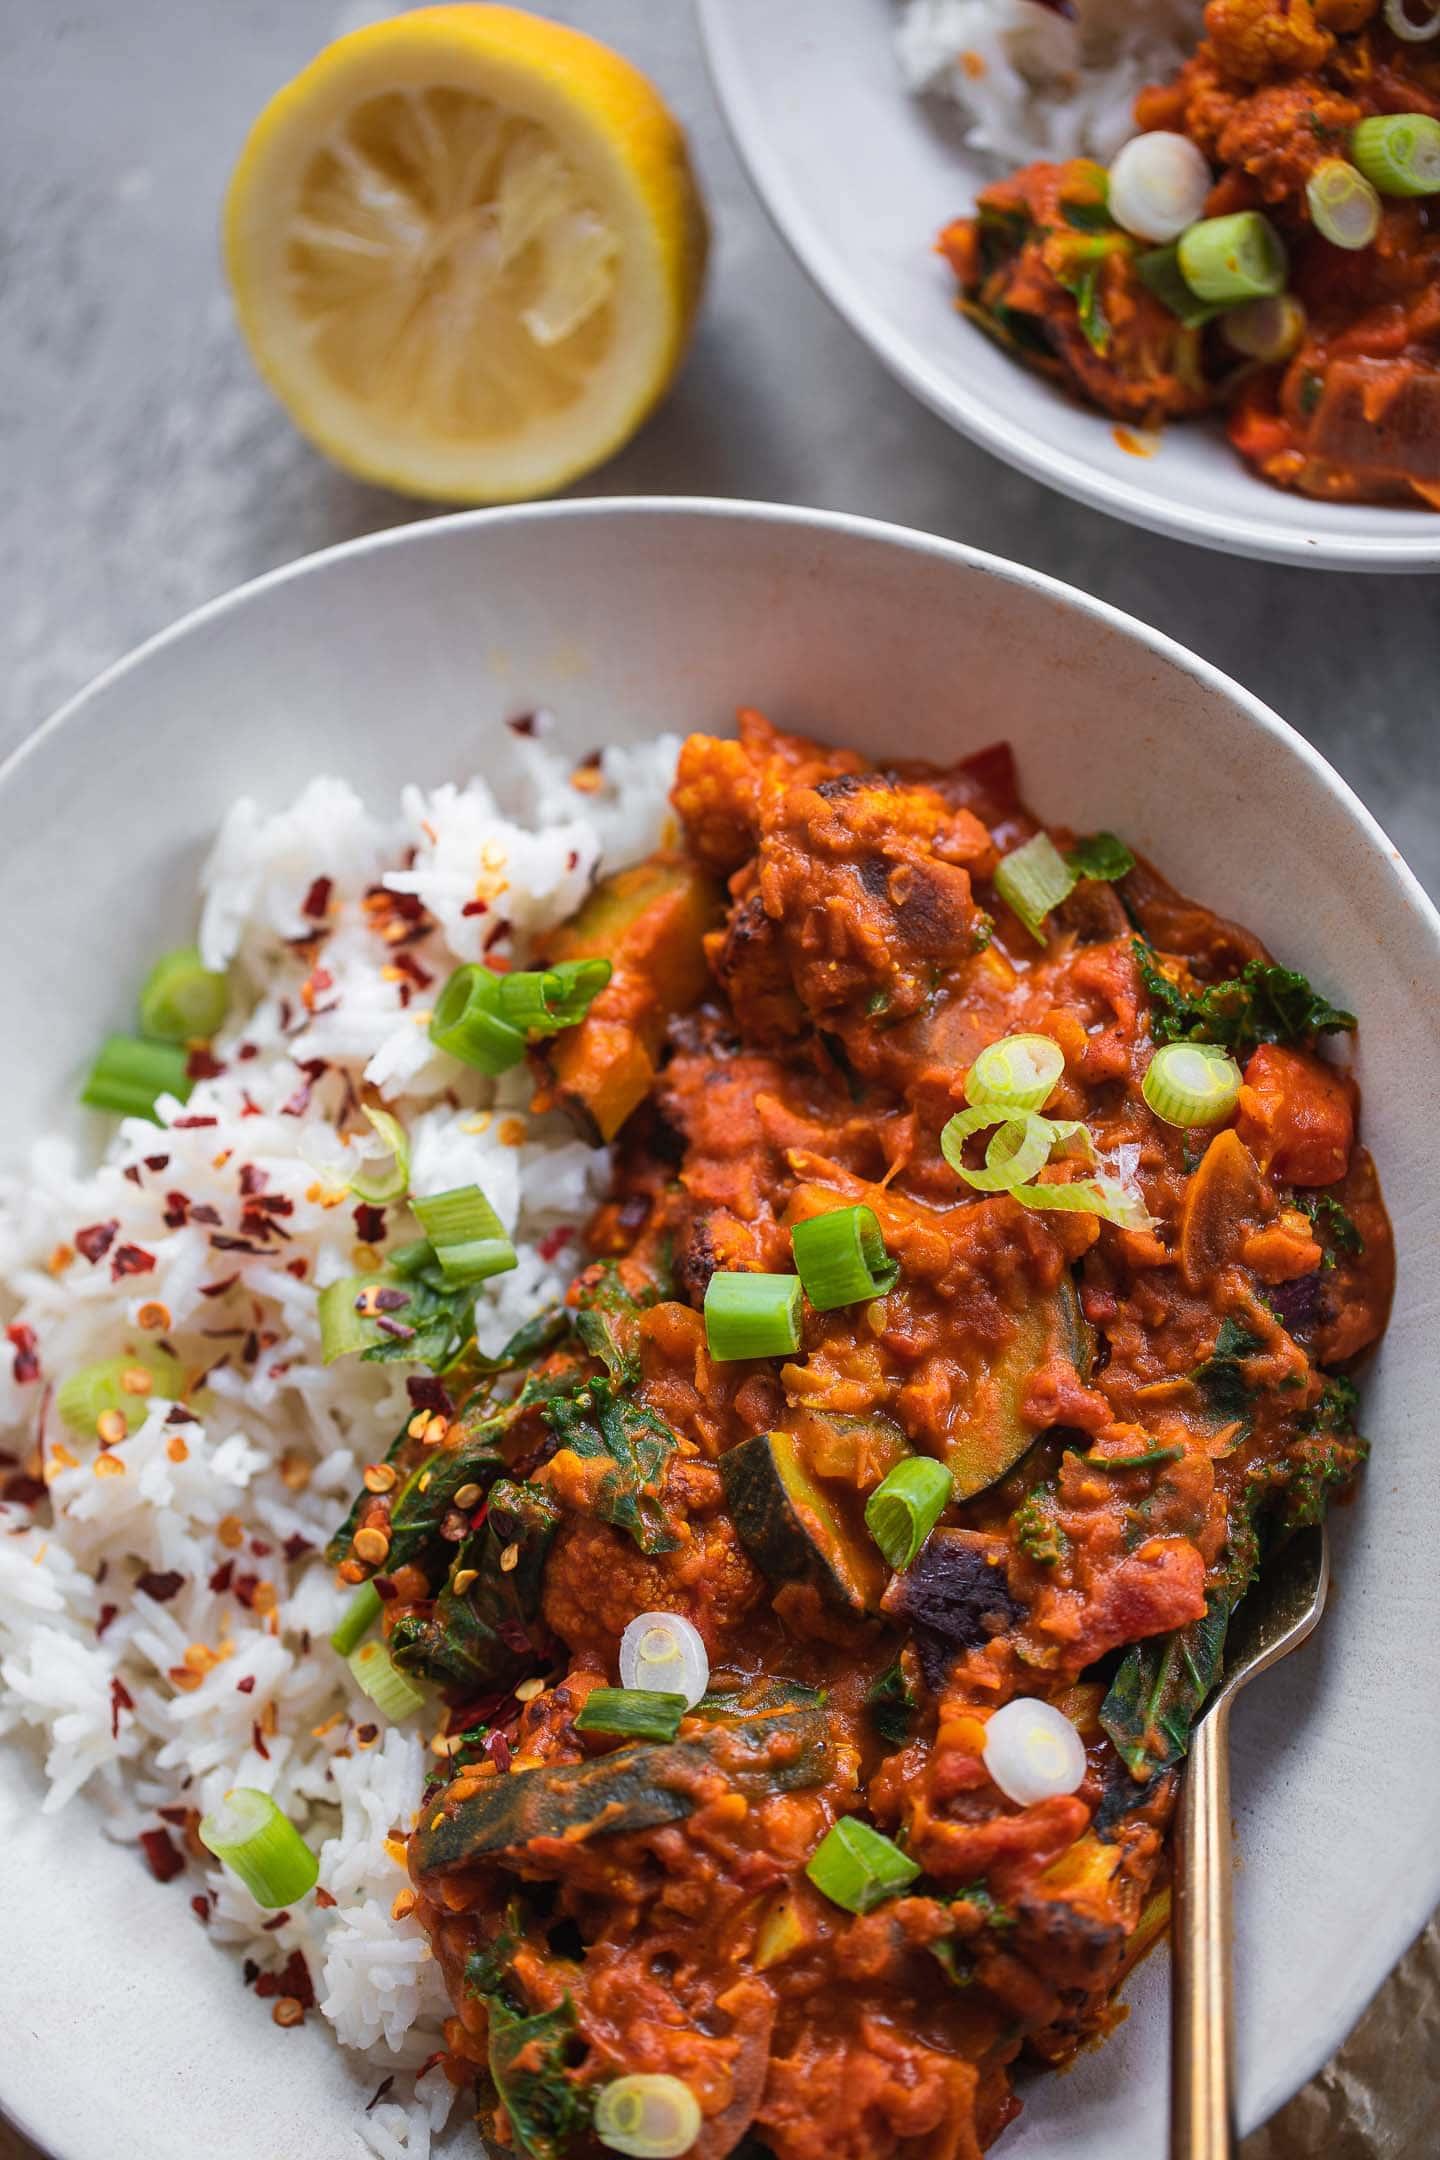 Bowl of vegan Dahl with red lentils